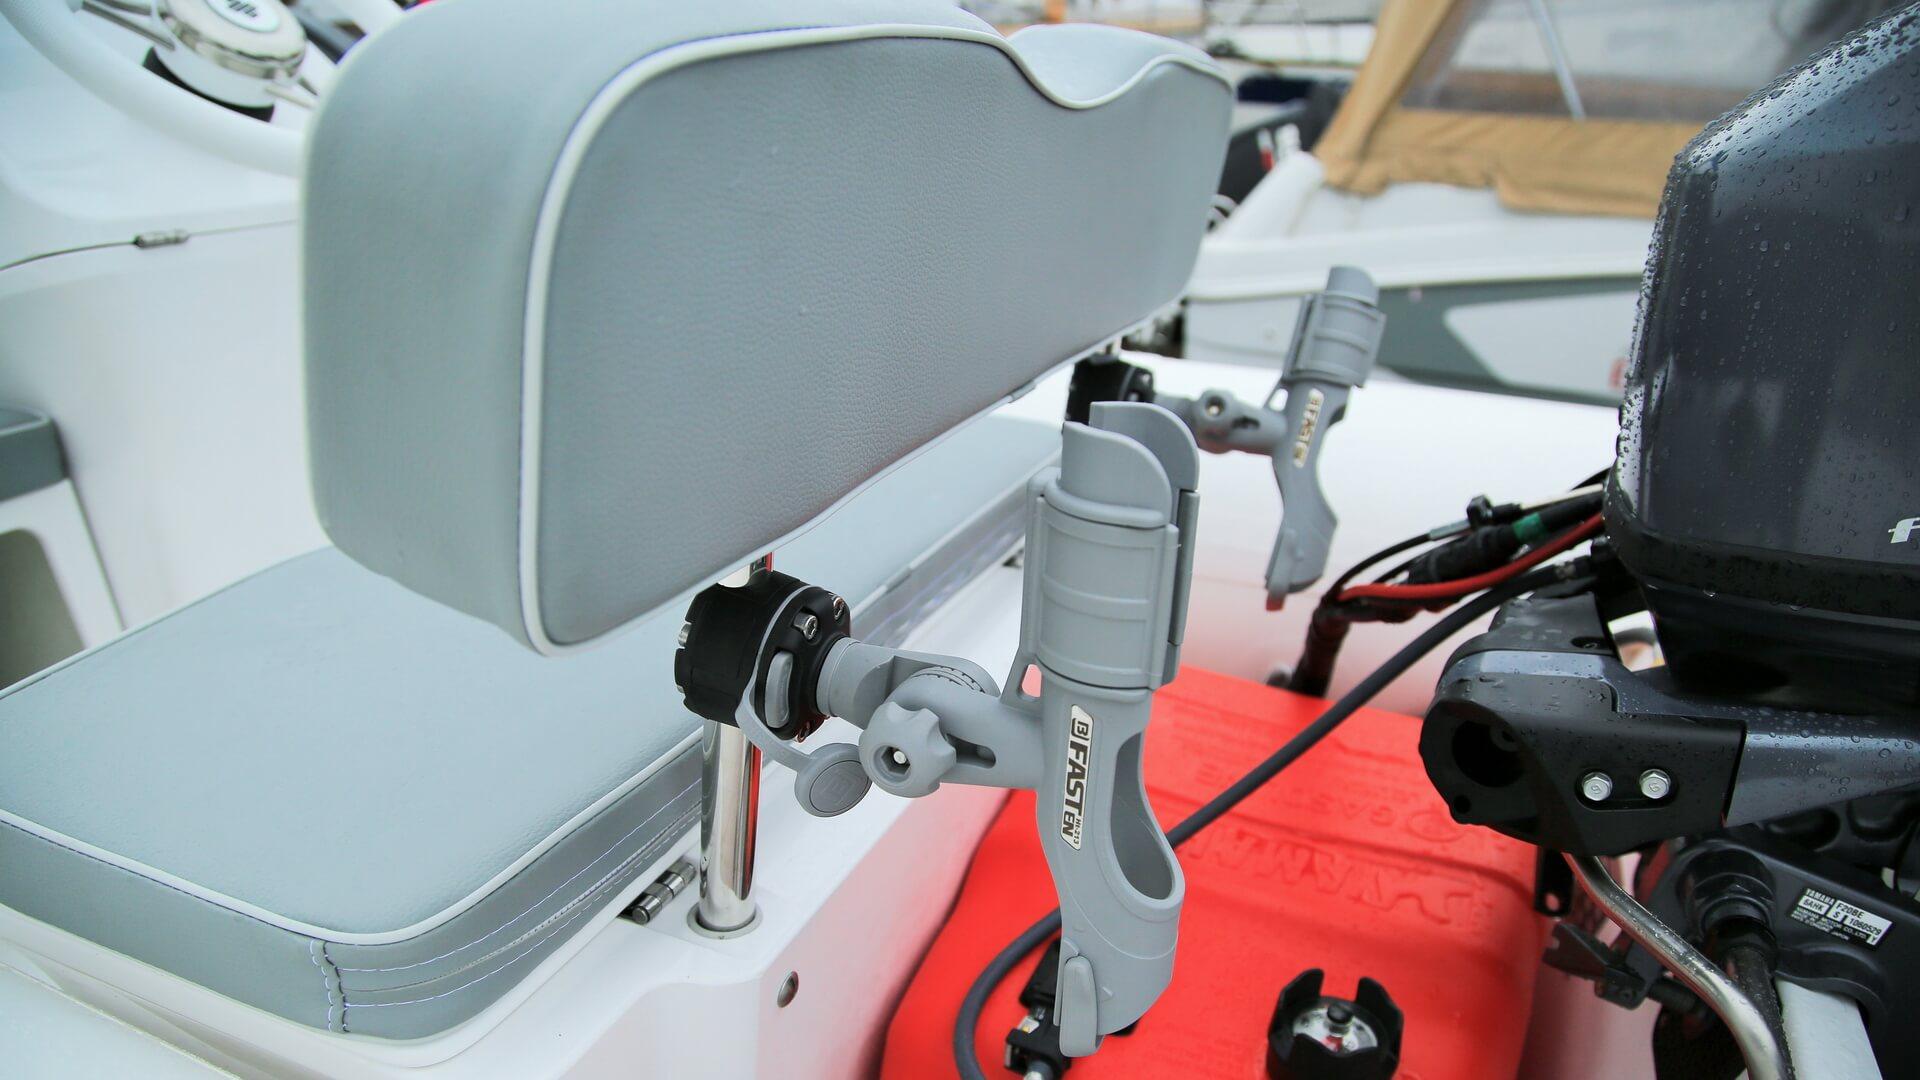 Надувная лодка с жестким дном GRAND Silver Line S300L, Надувная лодка GRAND Silver Line S300L, GRAND Silver Line S300L, GRAND Silver Line S300LF, GRAND S300L, GRAND S300LF, GRAND S300